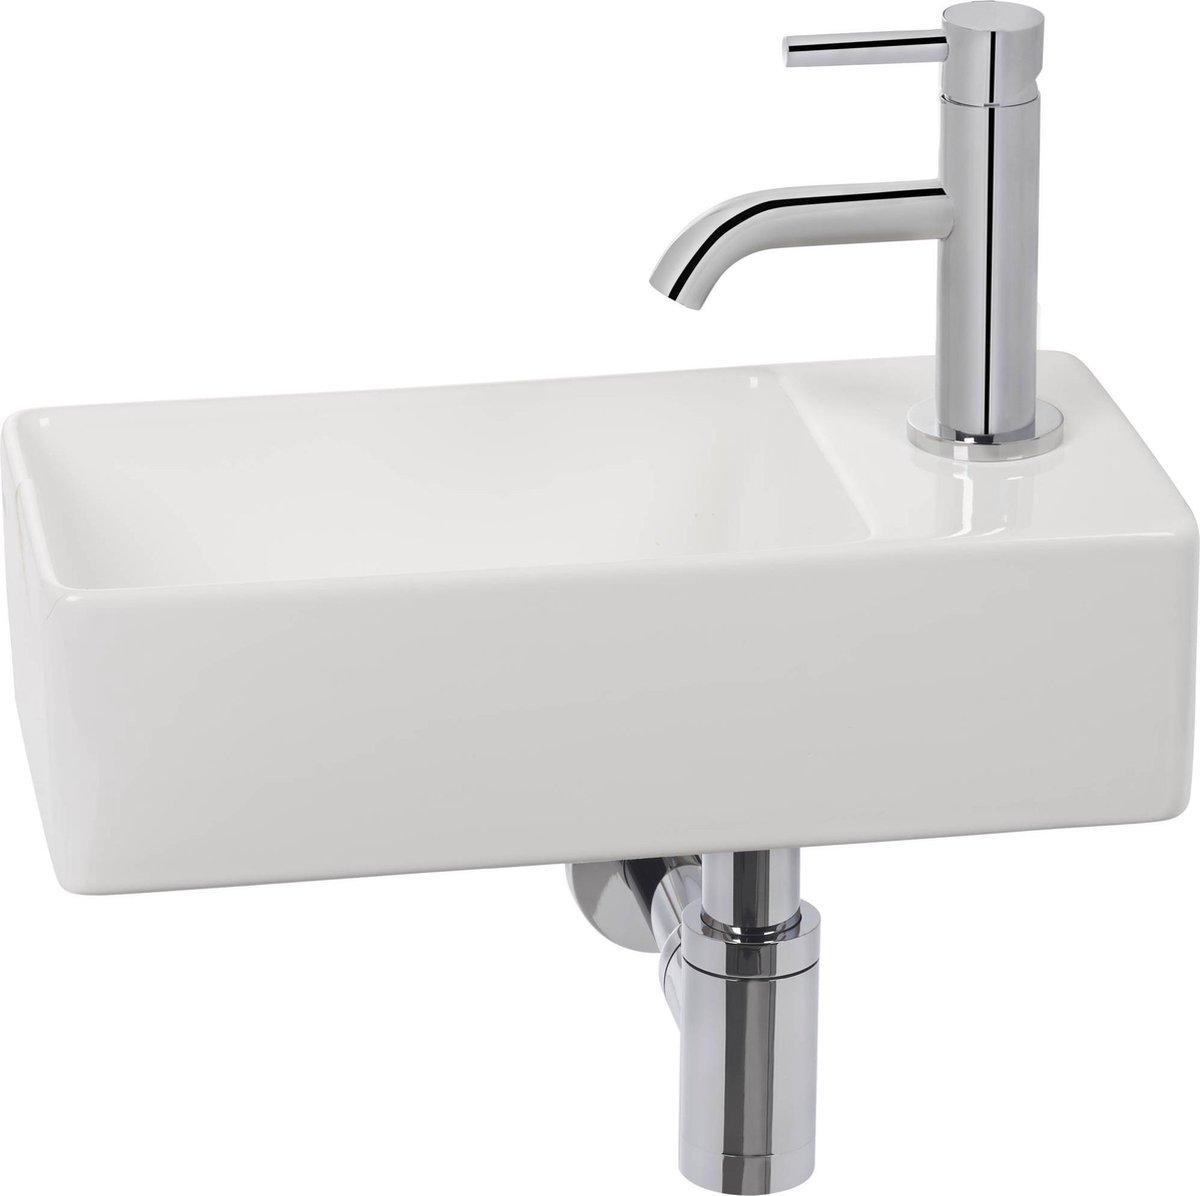 Clou New flush 3 Complete Fonteinset rechts Wit/Chroom